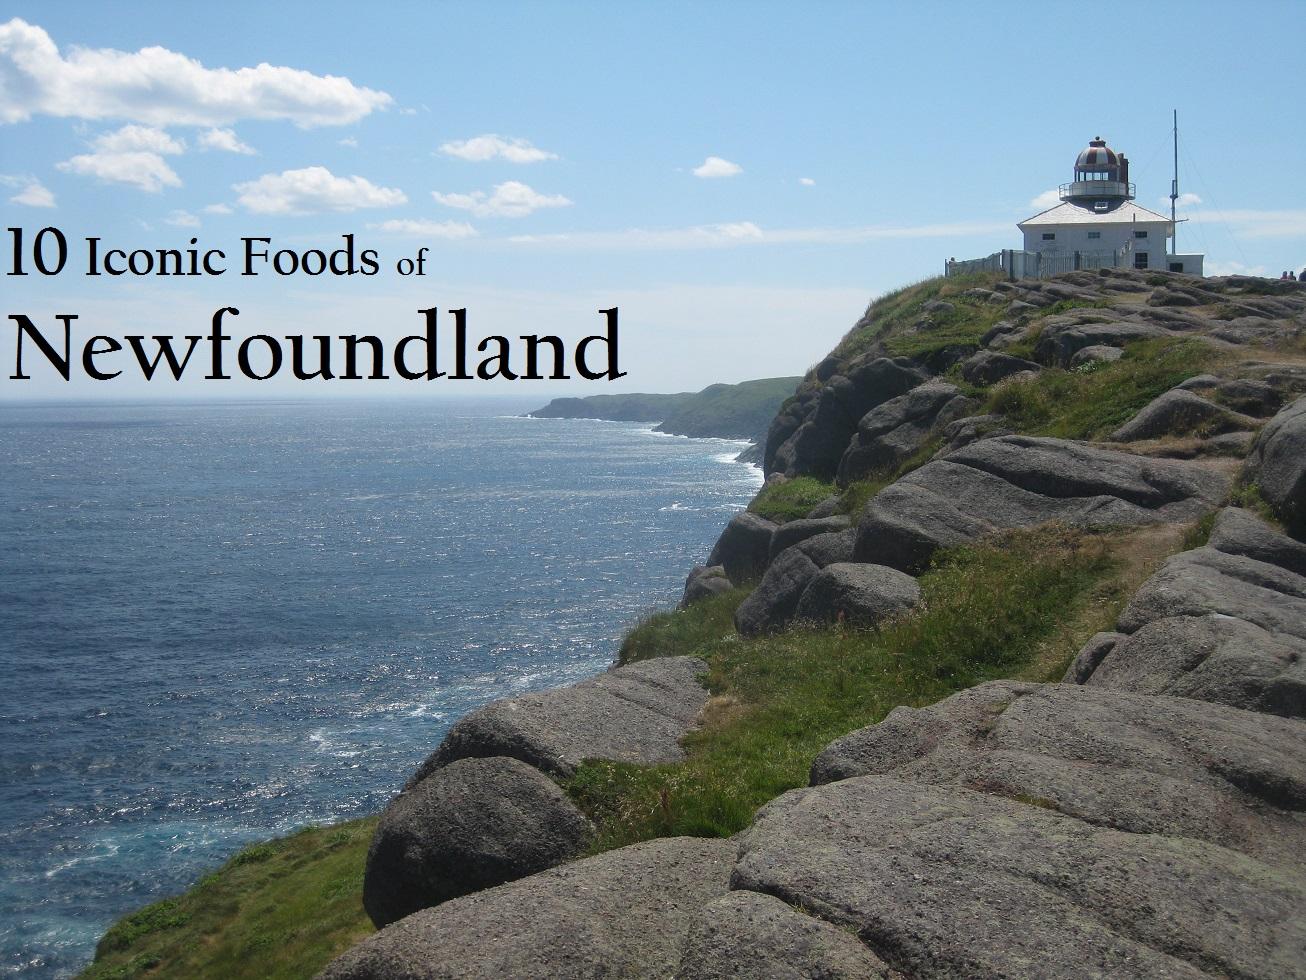 Canadian Food Newfoundland April 9, 2017